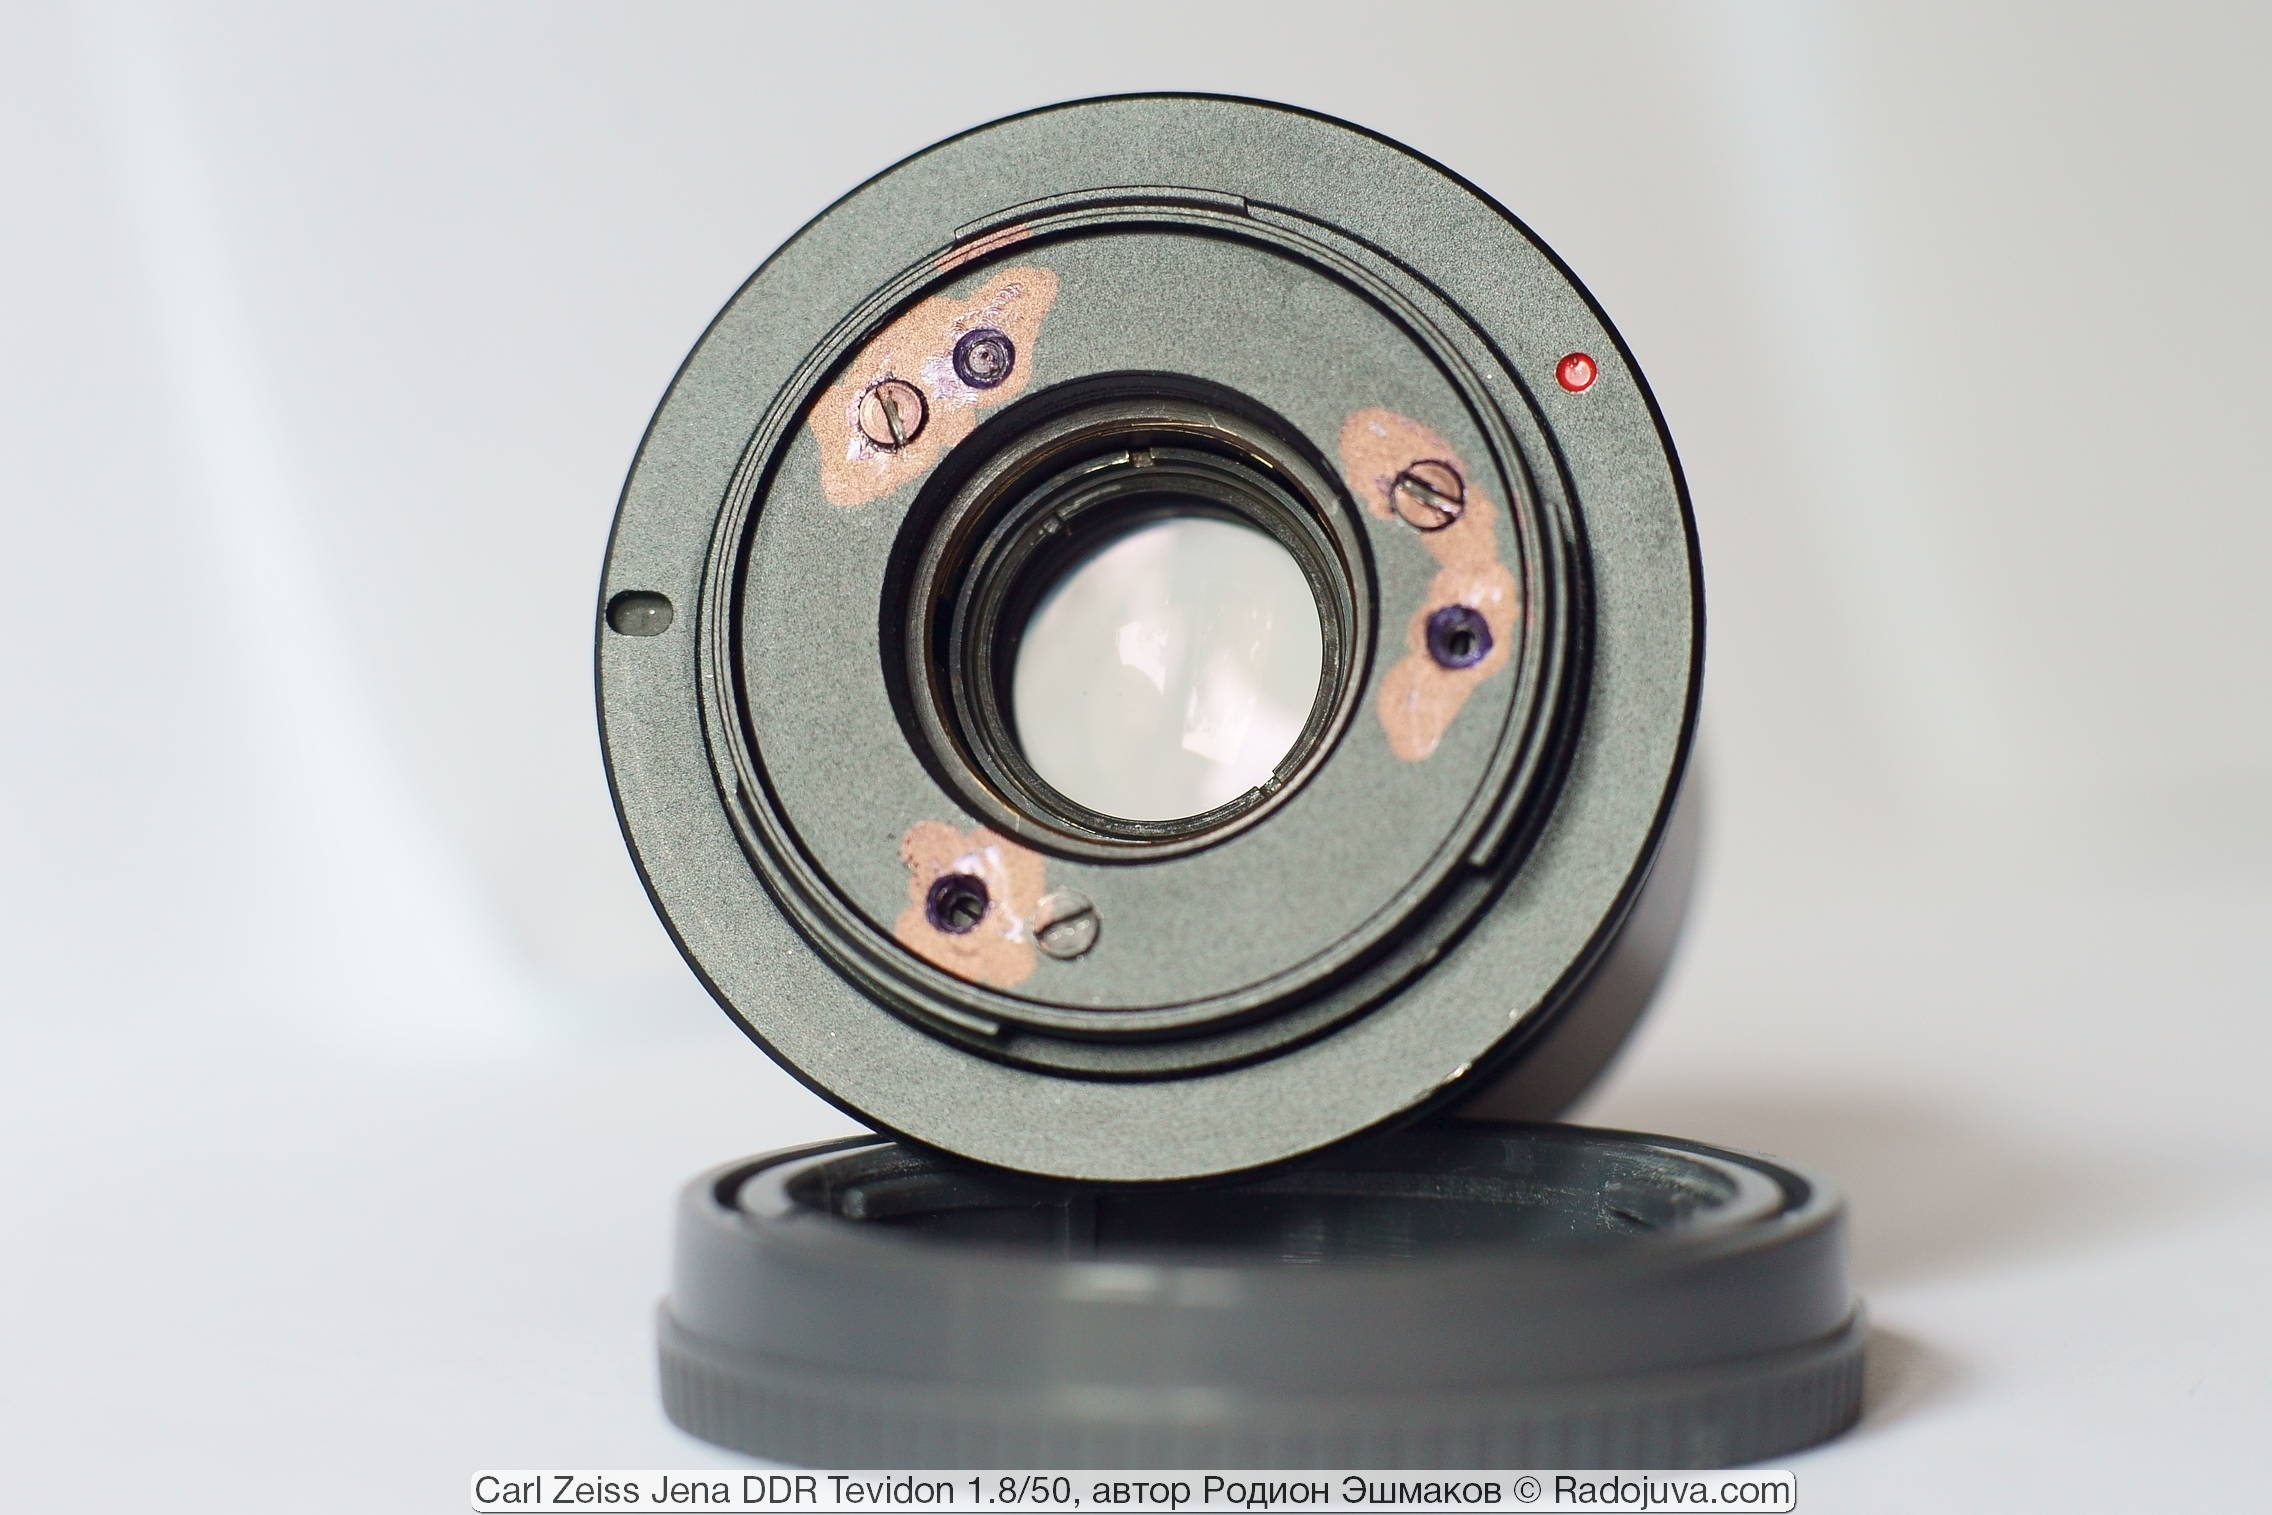 Вид адаптированного Tevidon 50/1.8 со стороны байонета E.